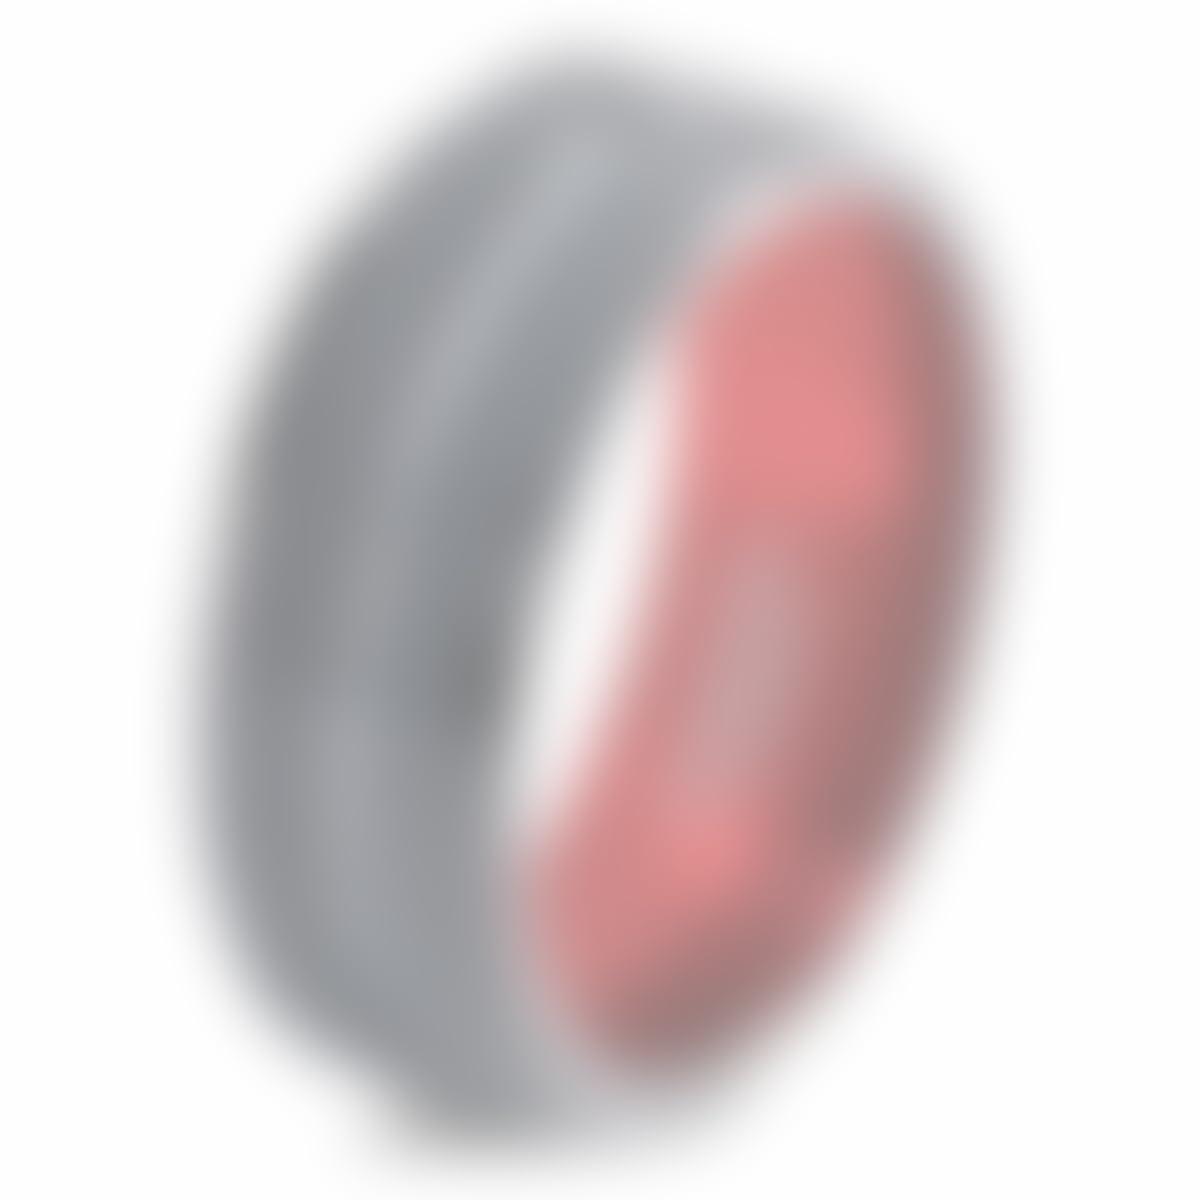 Amazon.com: Tungsten Wedding Band Ring 4mm 6mm 8mm 10mm for Men ...